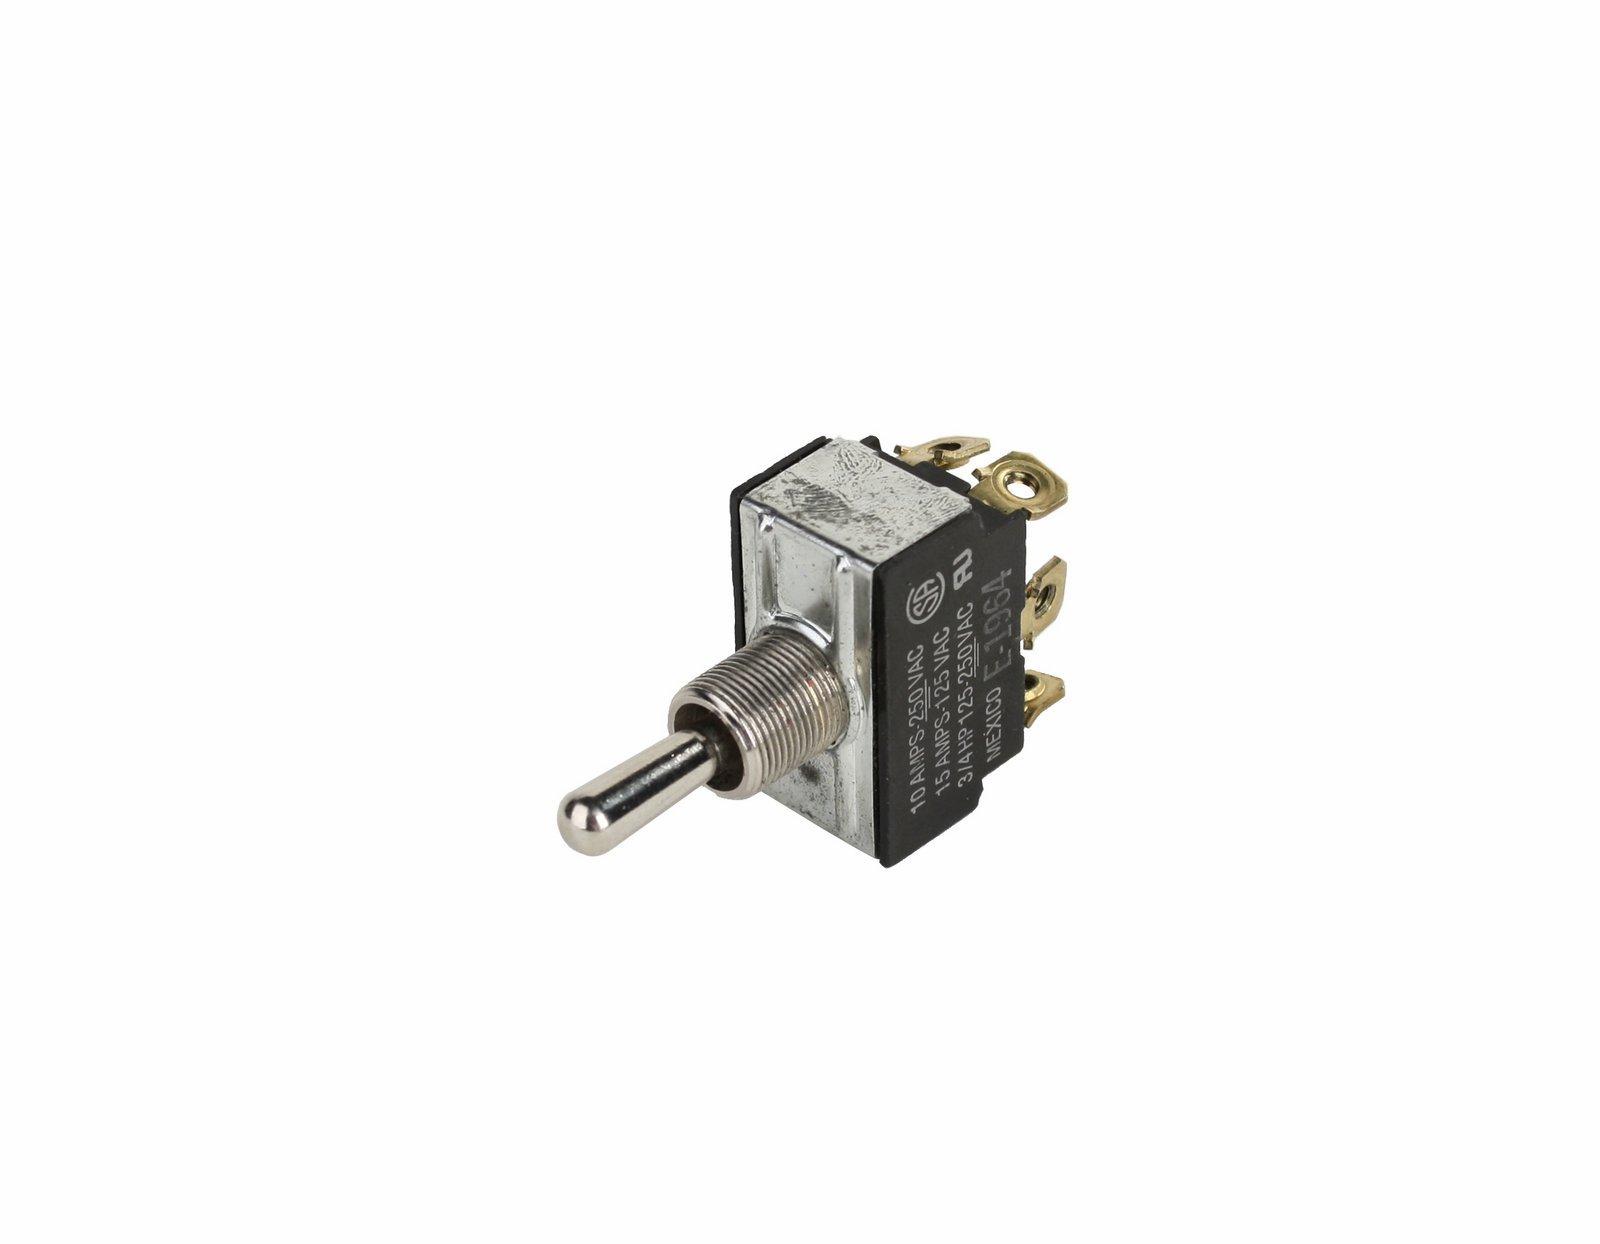 Steel Dragon Tools 44905 Toggle Switch E1964 fits RIDGID 700 Pipe Threading Machine